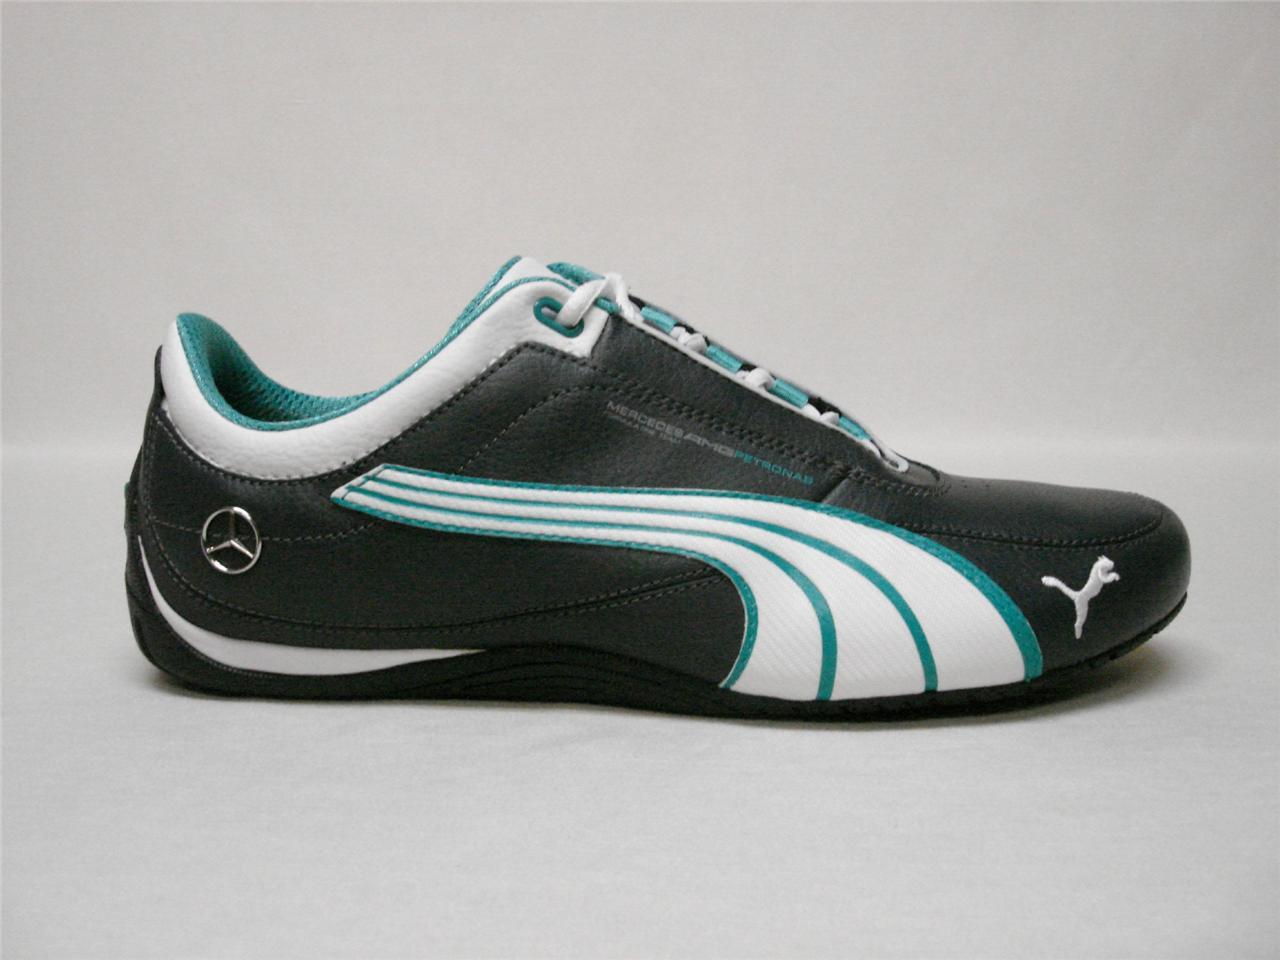 Nib puma drift cat 4 mamgp grey white mercedes mens shoes for Puma mercedes benz